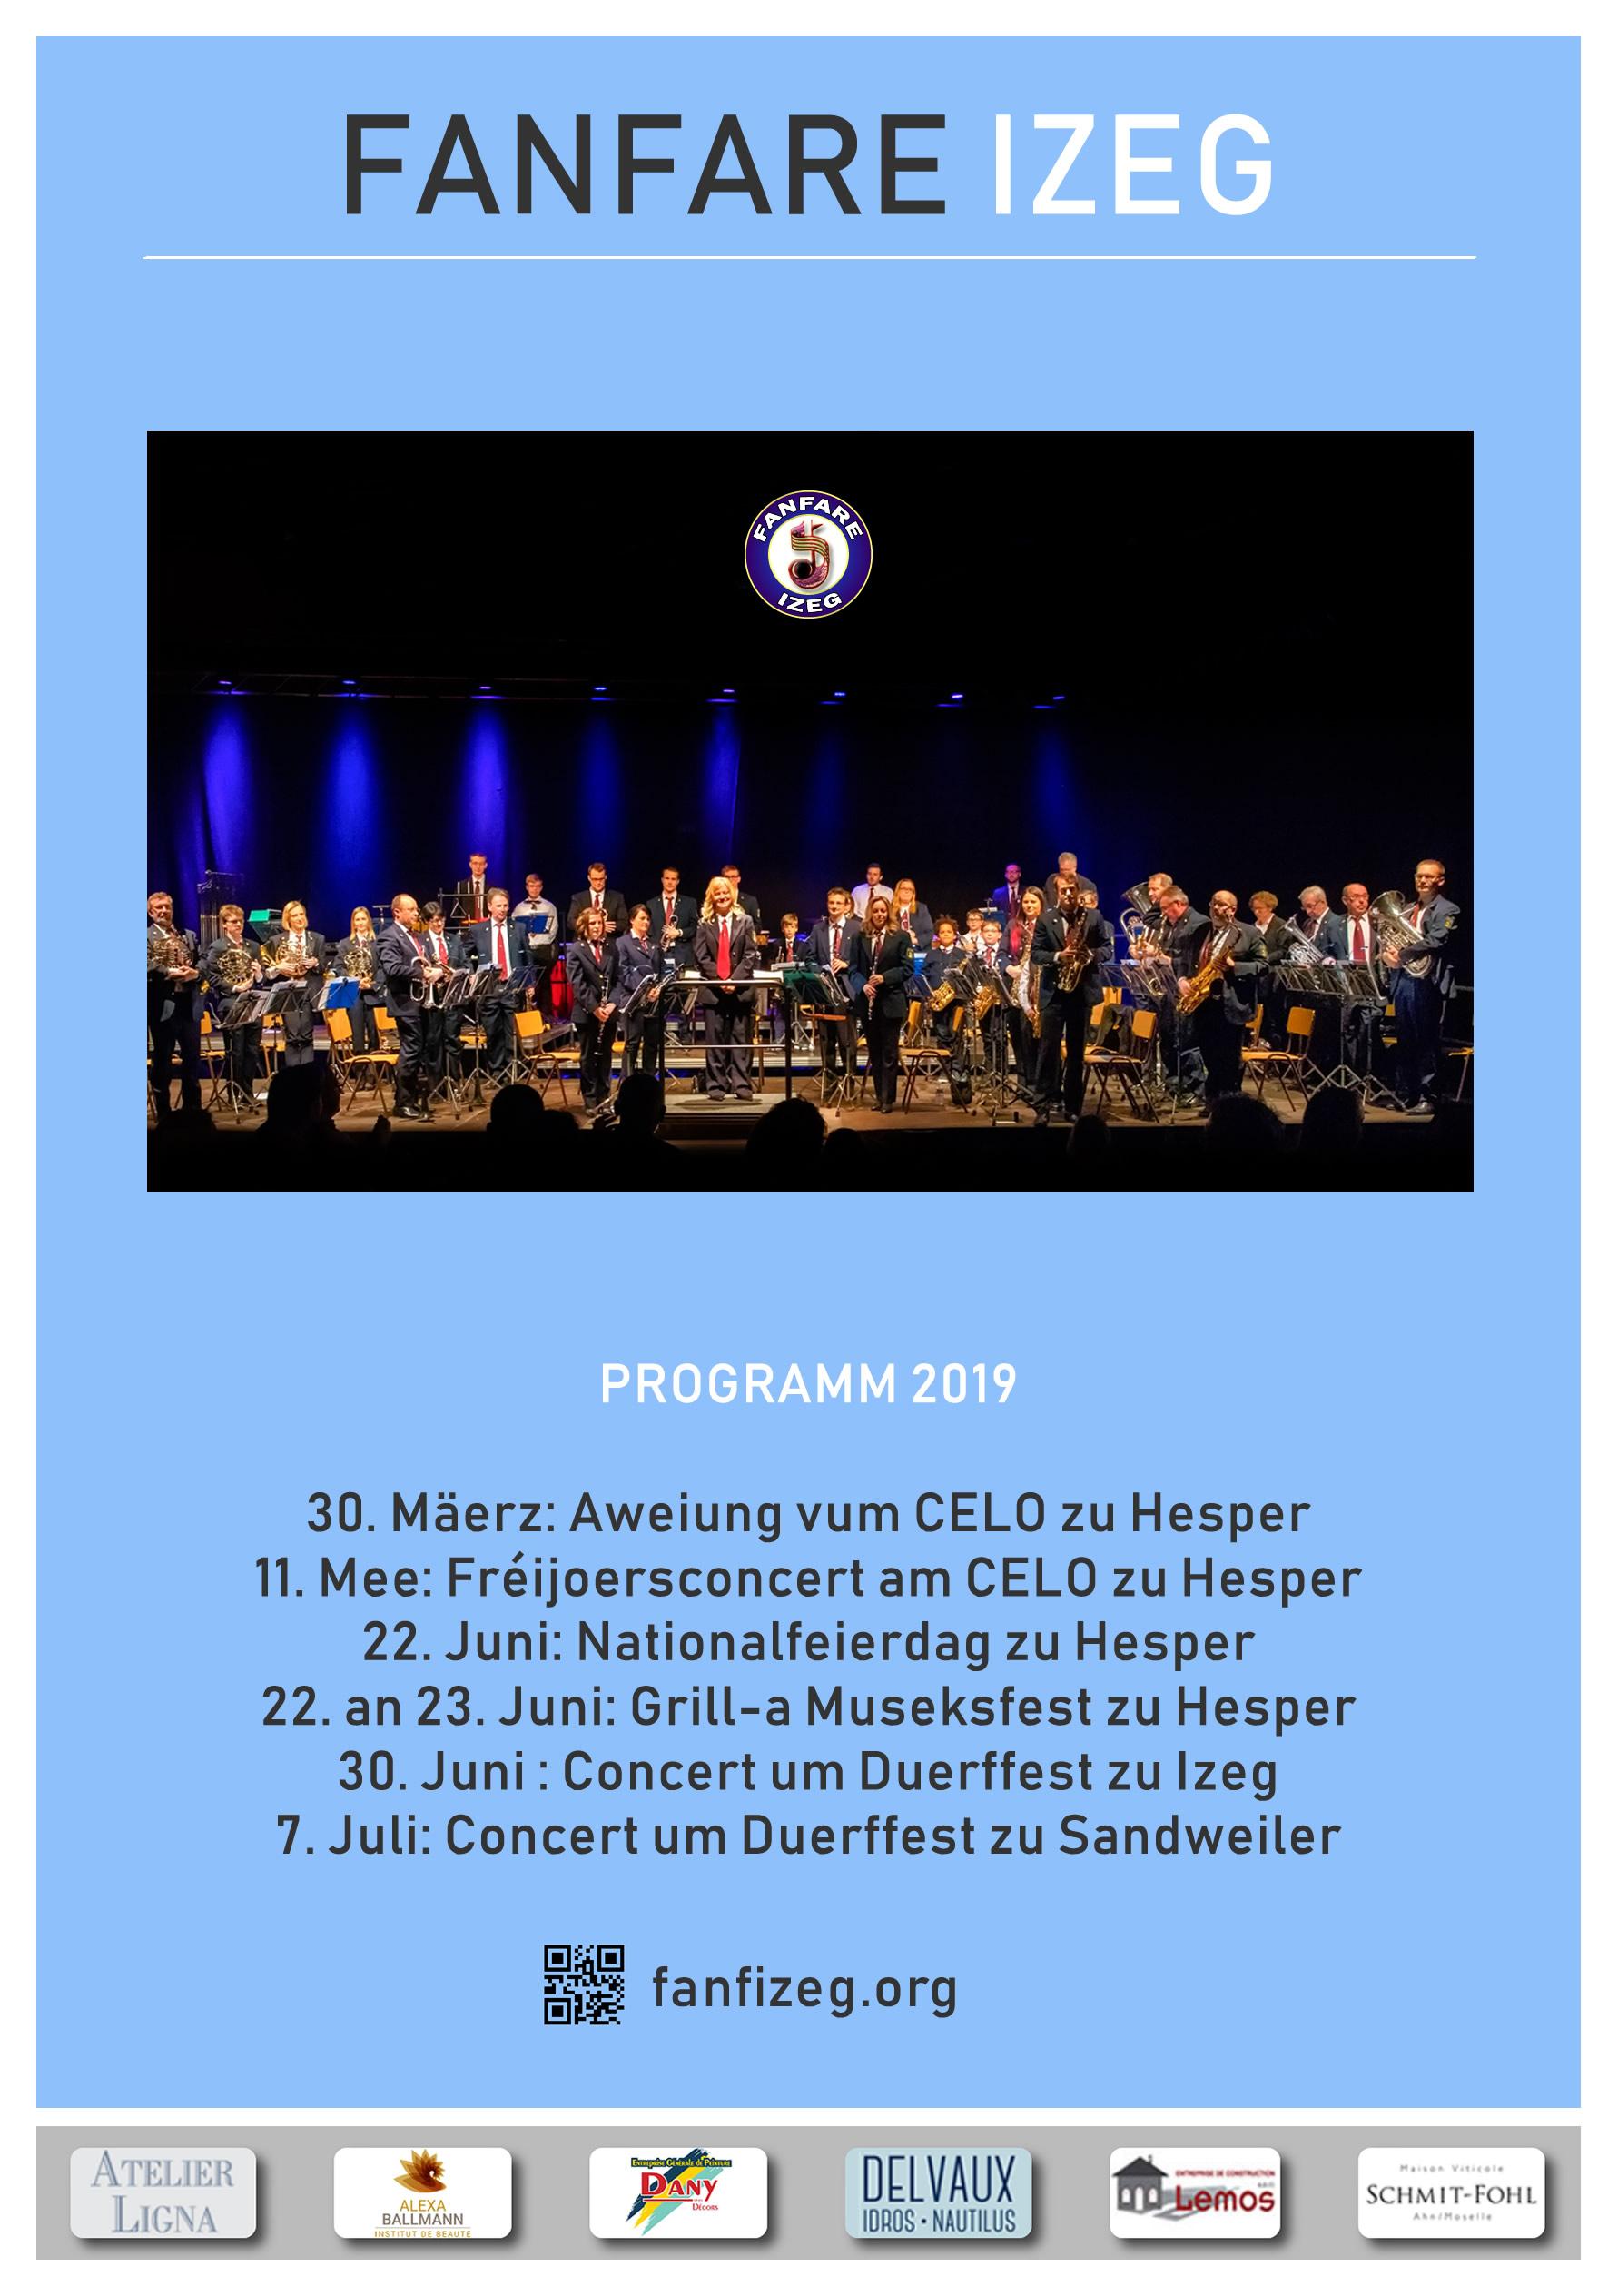 Fanfare Izeg Programm 2019